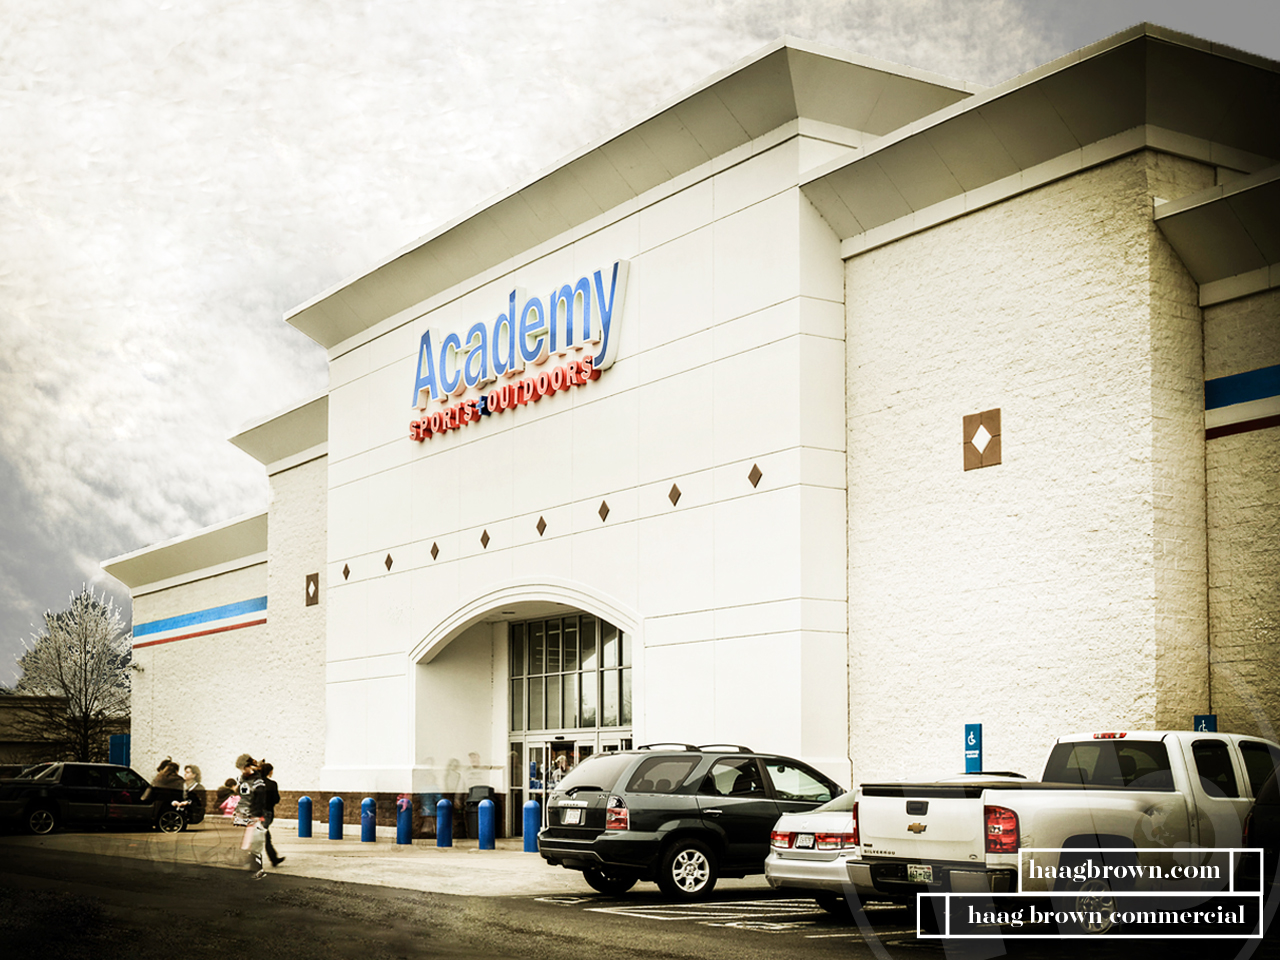 Academy Sports in Jonesboro, AR